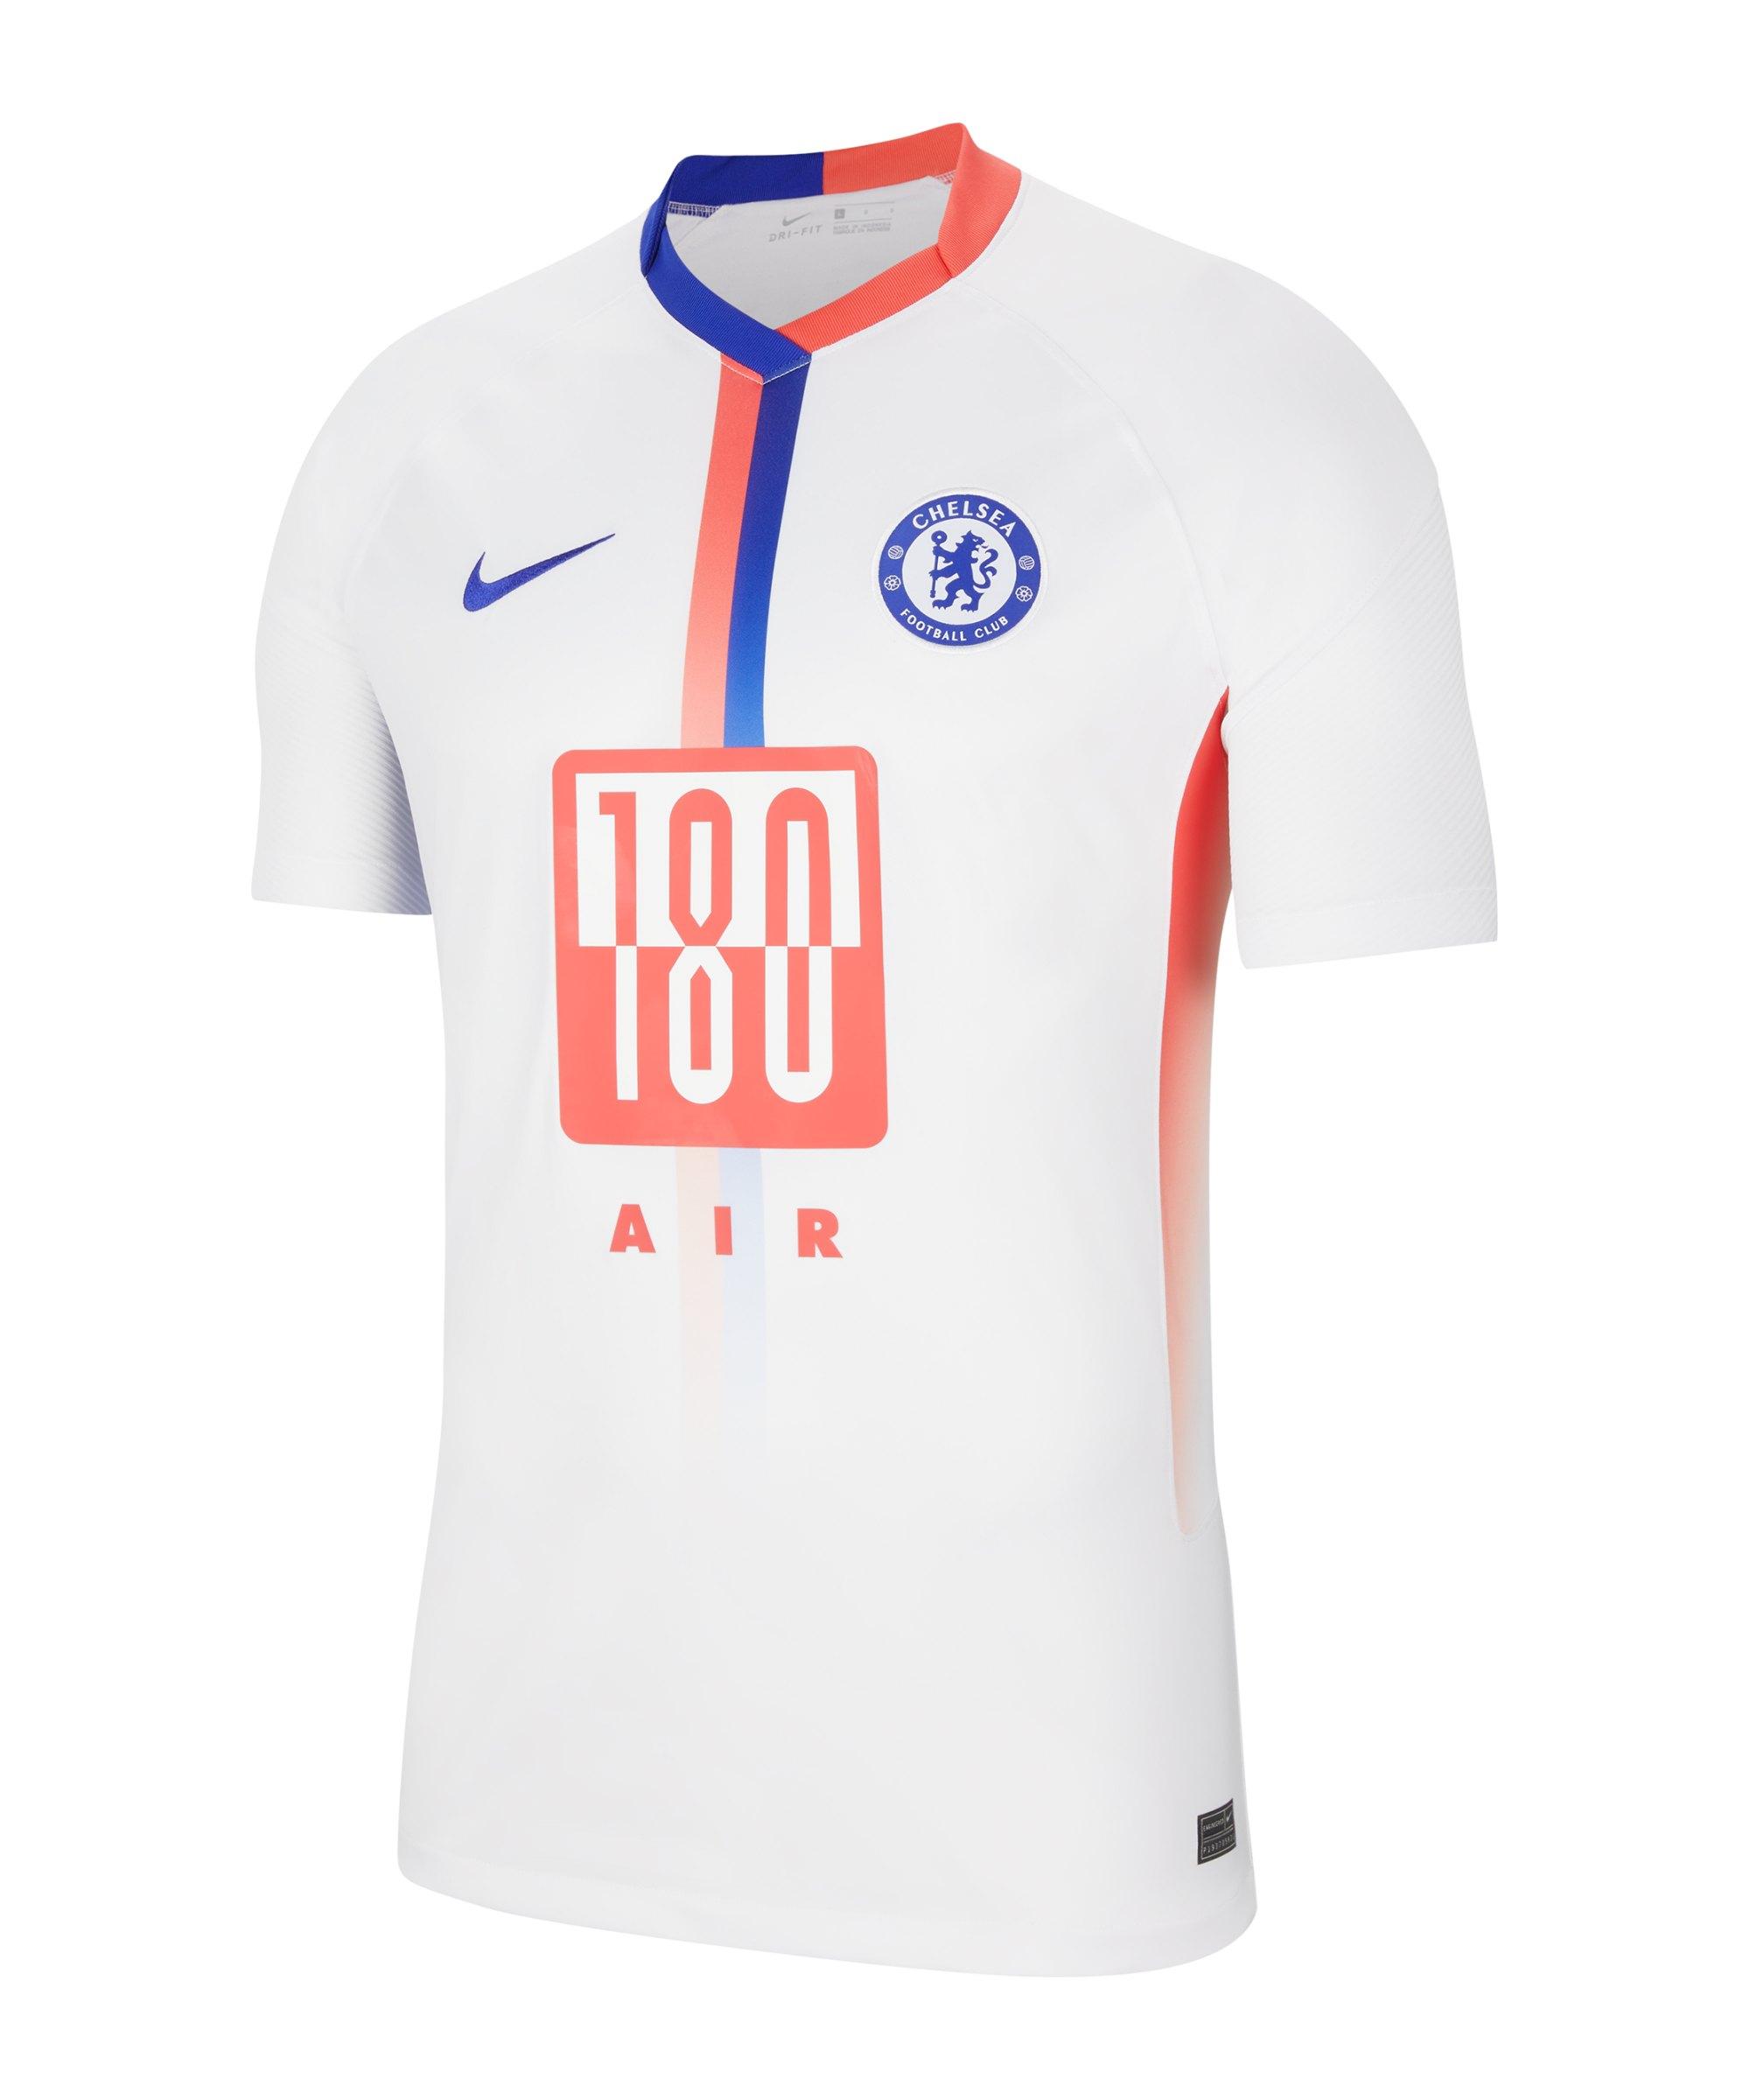 Nike FC Chelsea London Air Max Trikot 2020/2021 Kids Weiss F101 - weiss